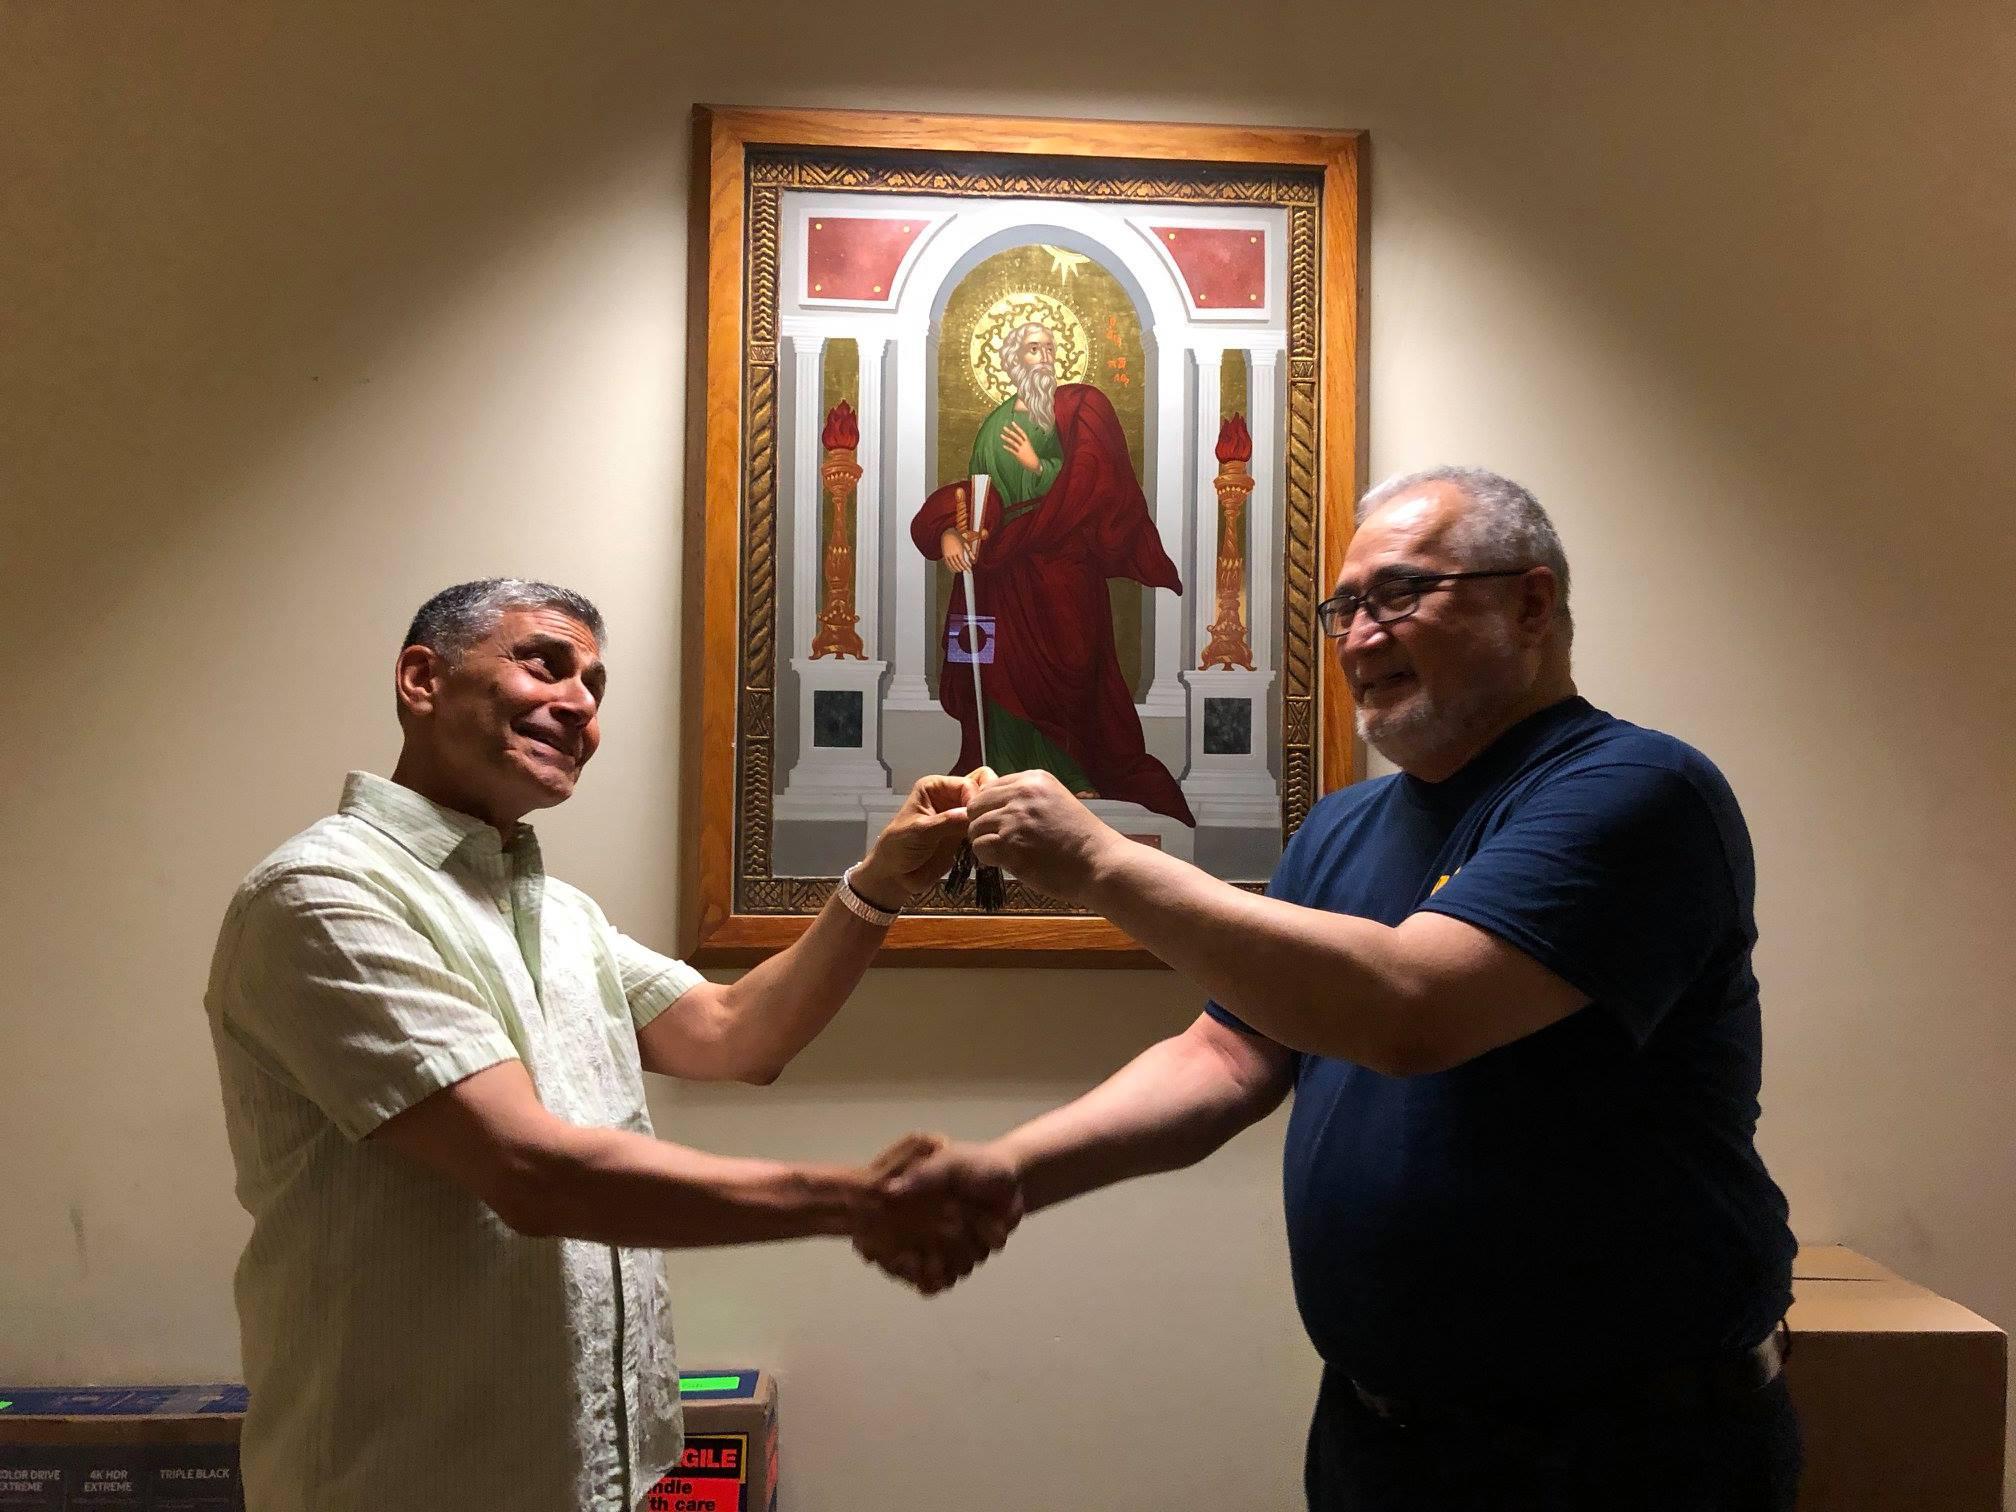 fr-gil-hands-keys-to-st-pauls-to-fr-joe-june-29-2018